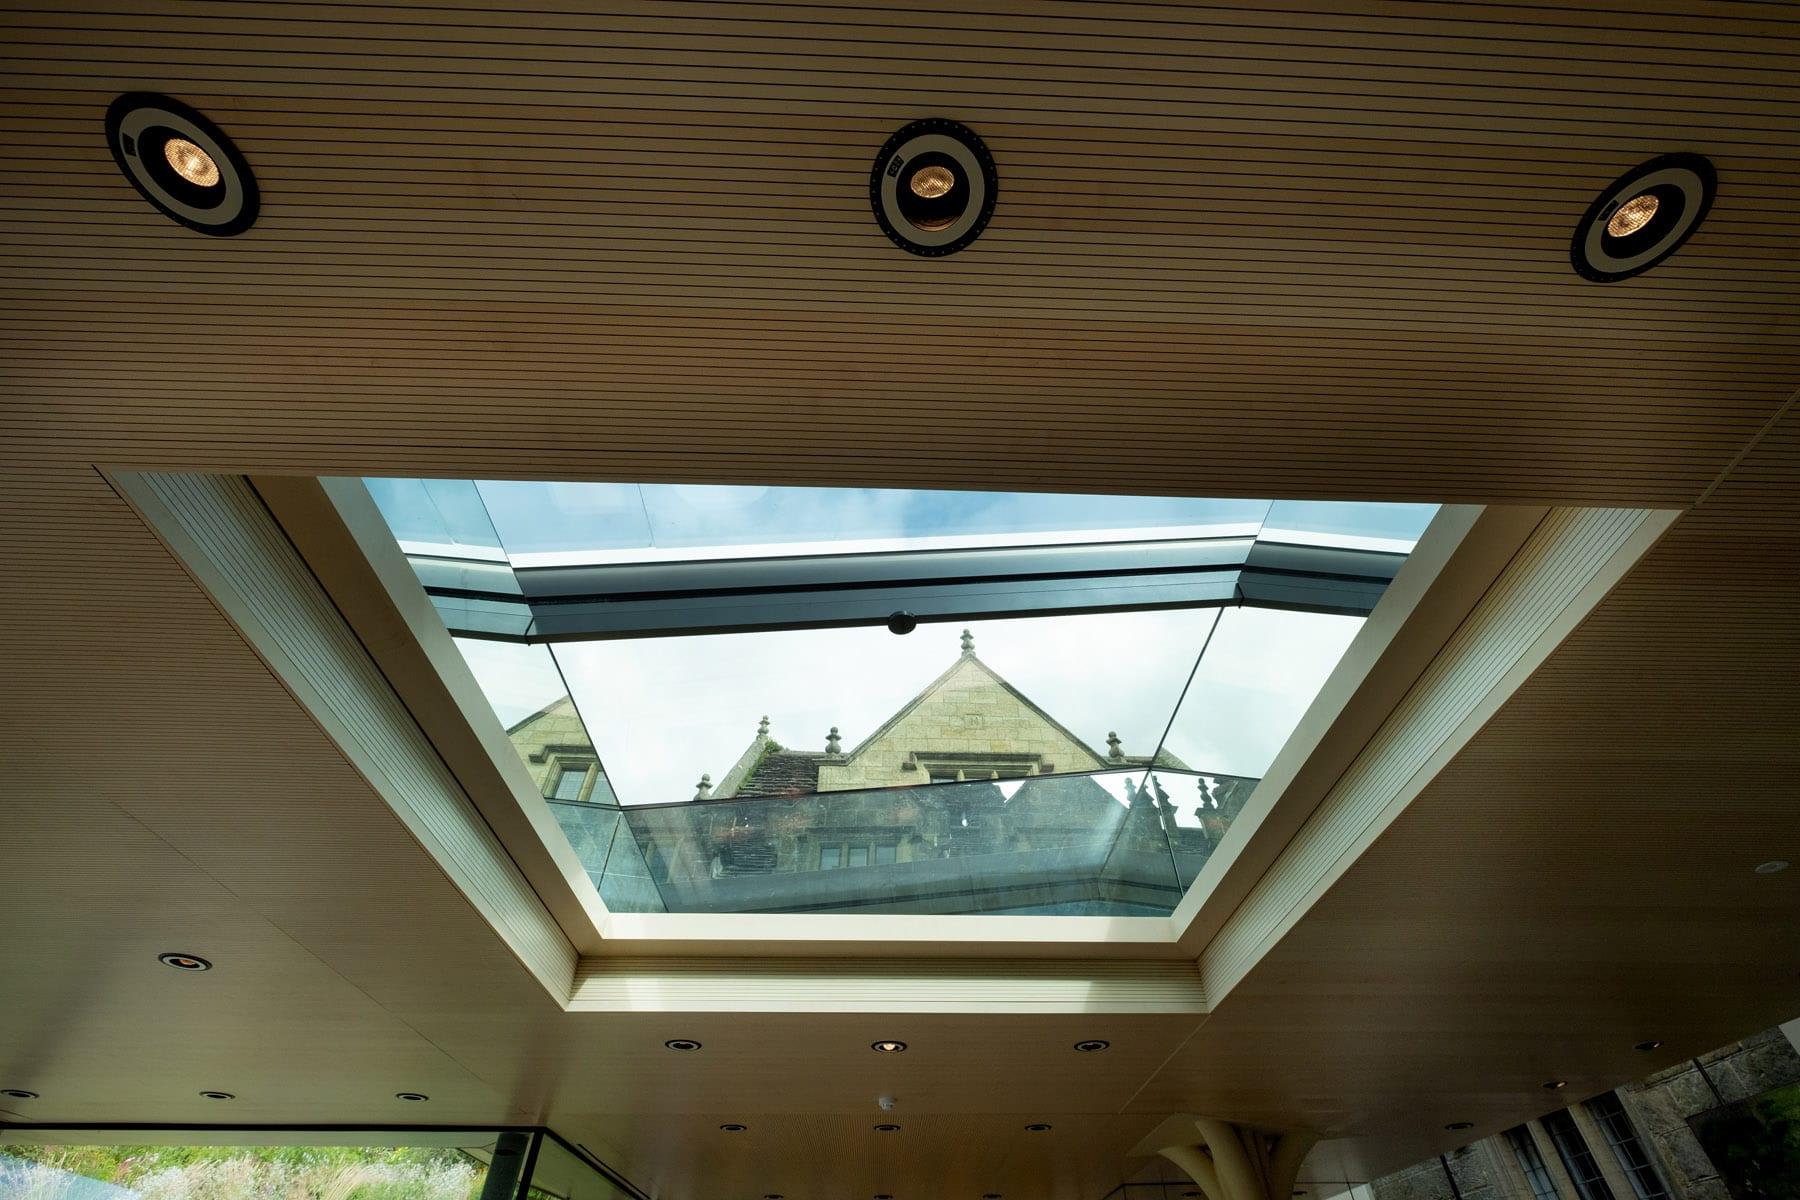 Electric sliding rooflight